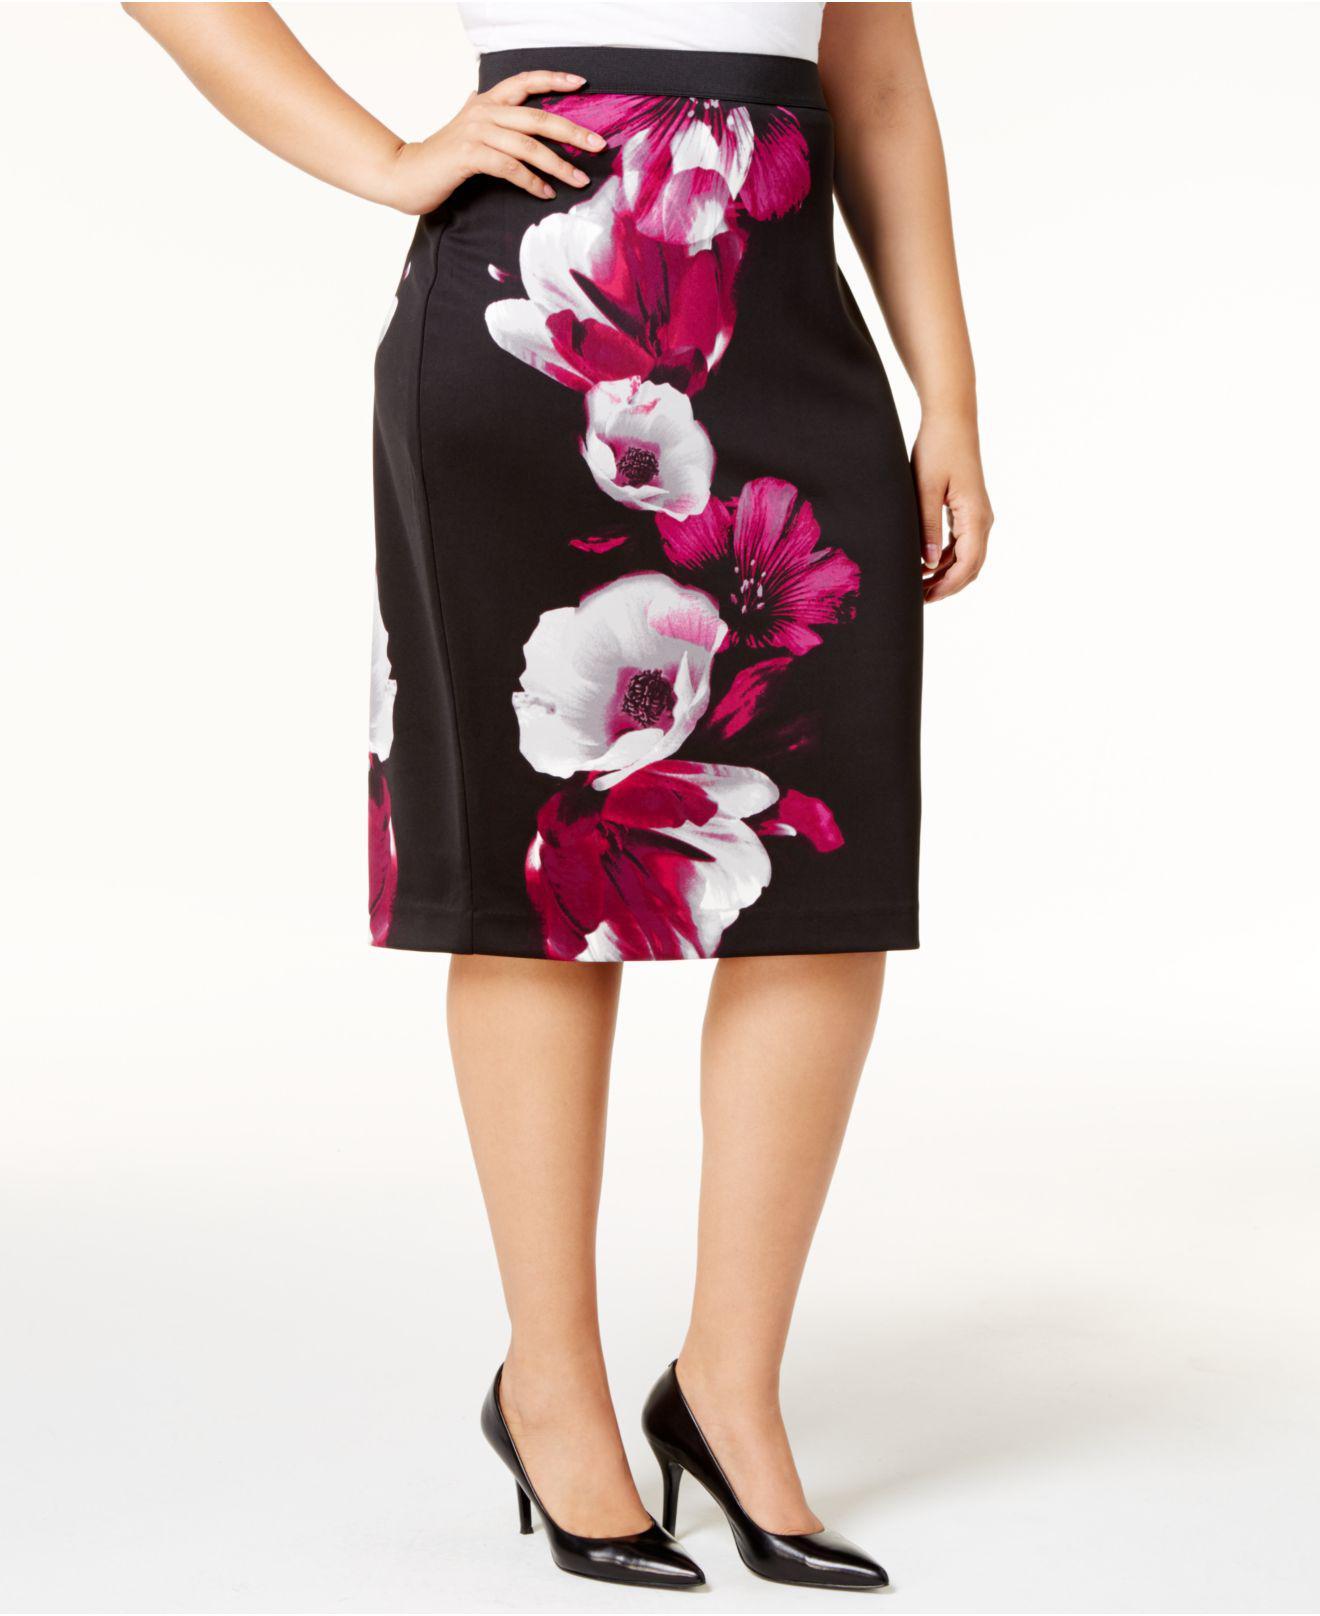 c1113ba993 Lyst - Alfani Plus Size Printed Pencil Skirt